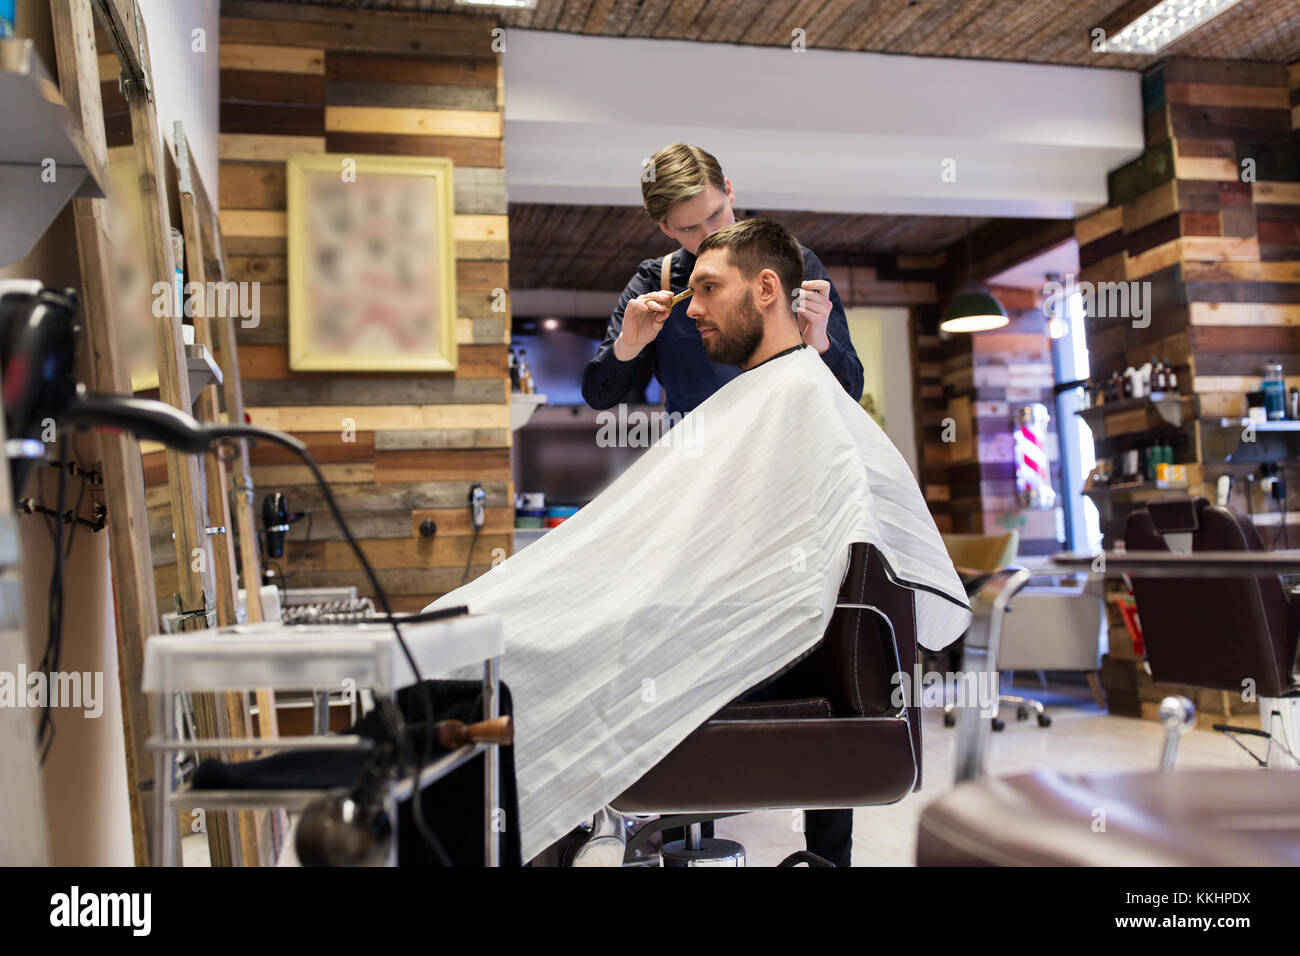 man and barber cutting hair at barbershop - Stock Image